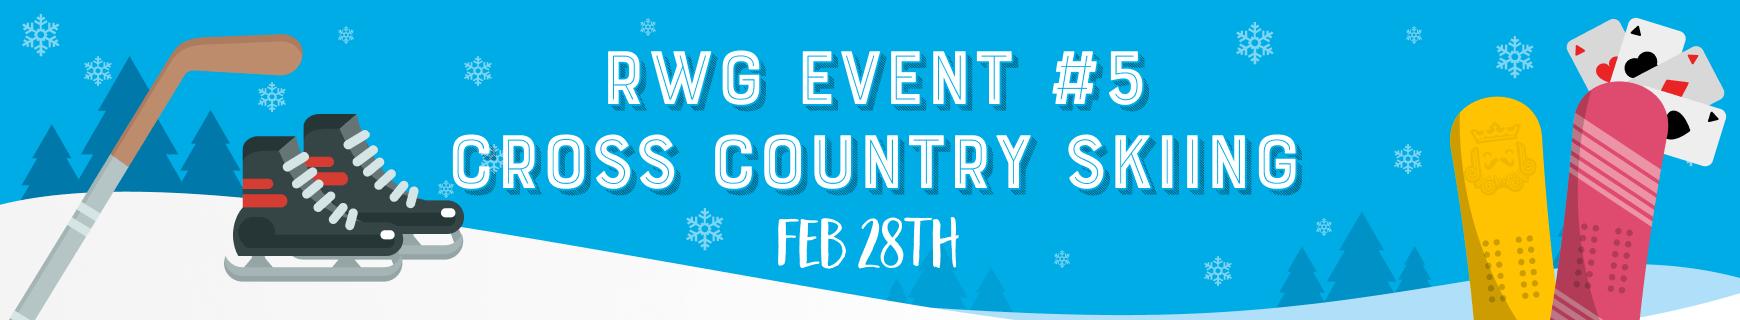 Replay winter games   5   cross country skiing   dashboard %28870 x 160%29 x2